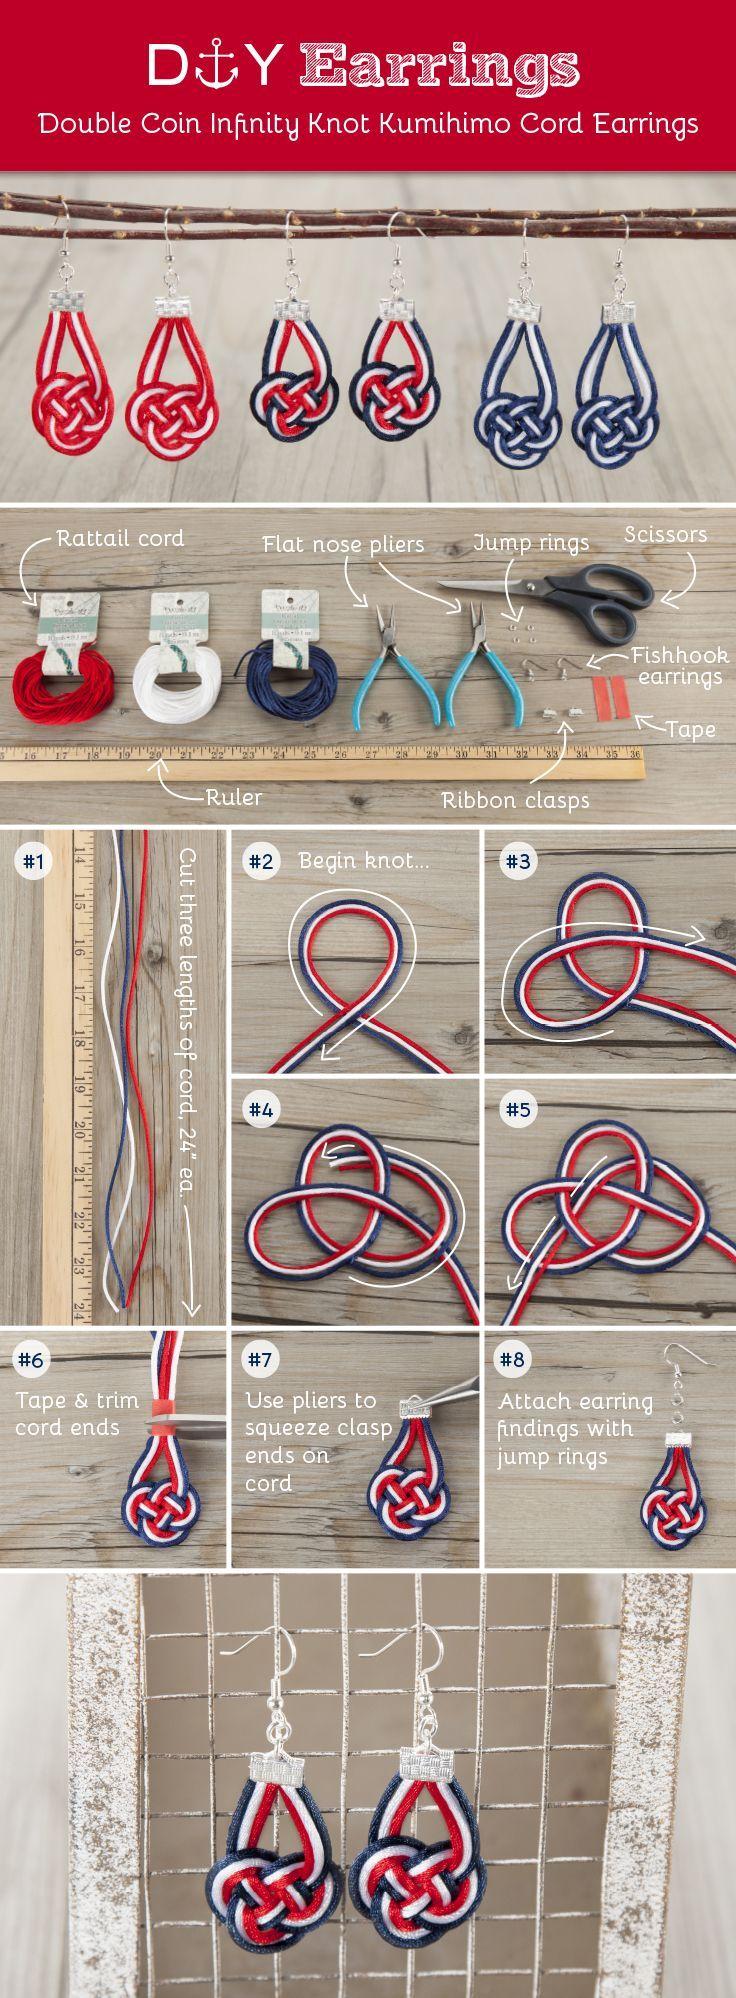 Double Coin Infinity Knot Kumihimo Cord Earrings